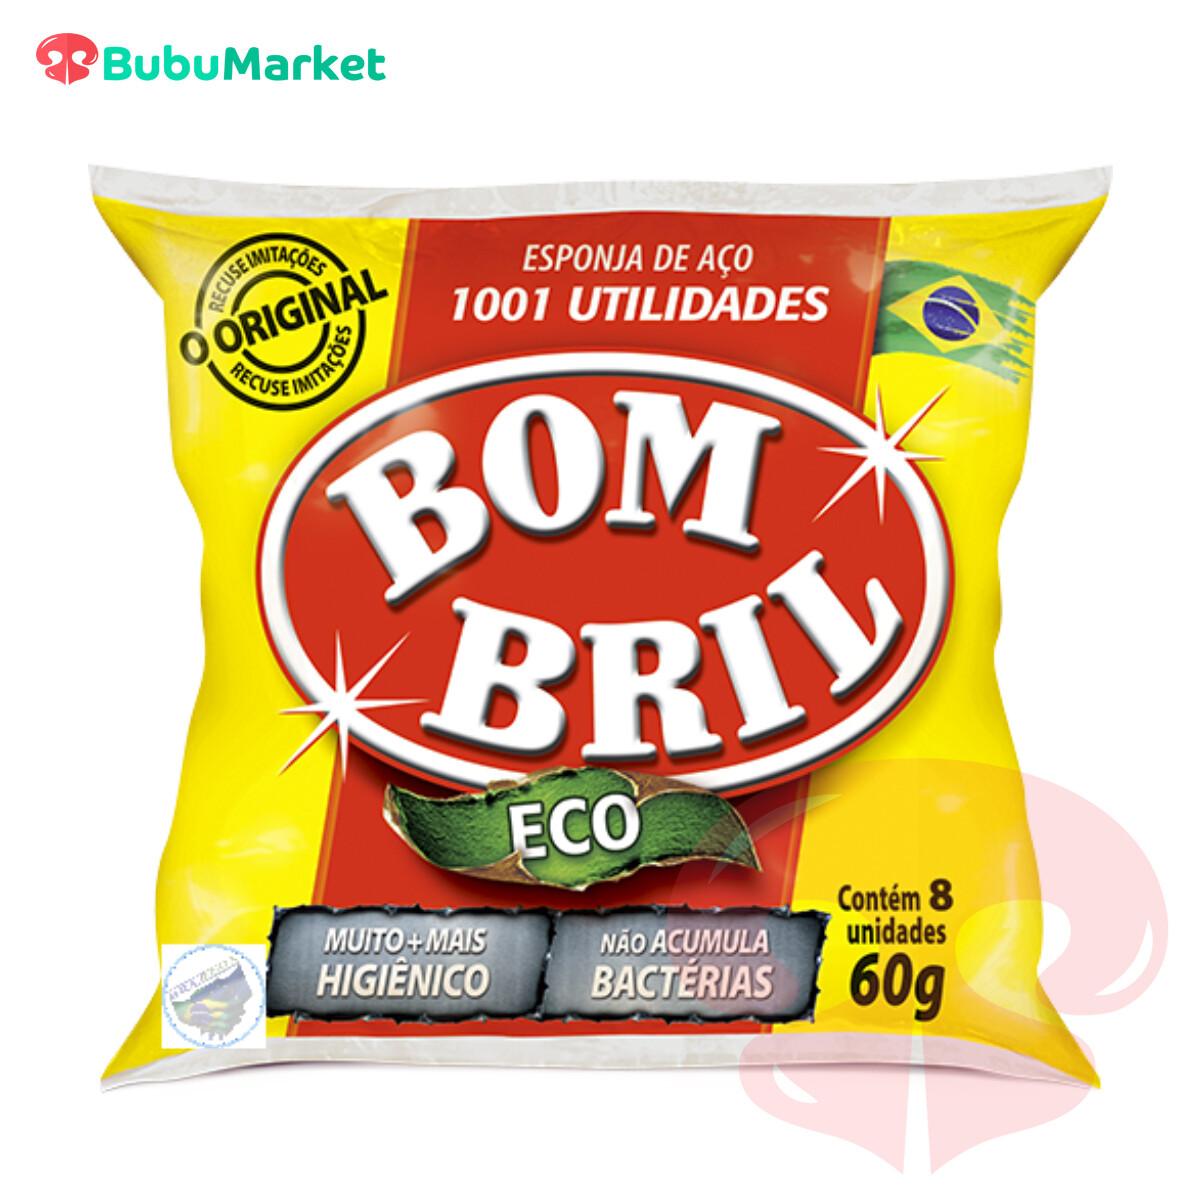 BOM BRIL ECO ESPONJA DE ACERO 60 GR.